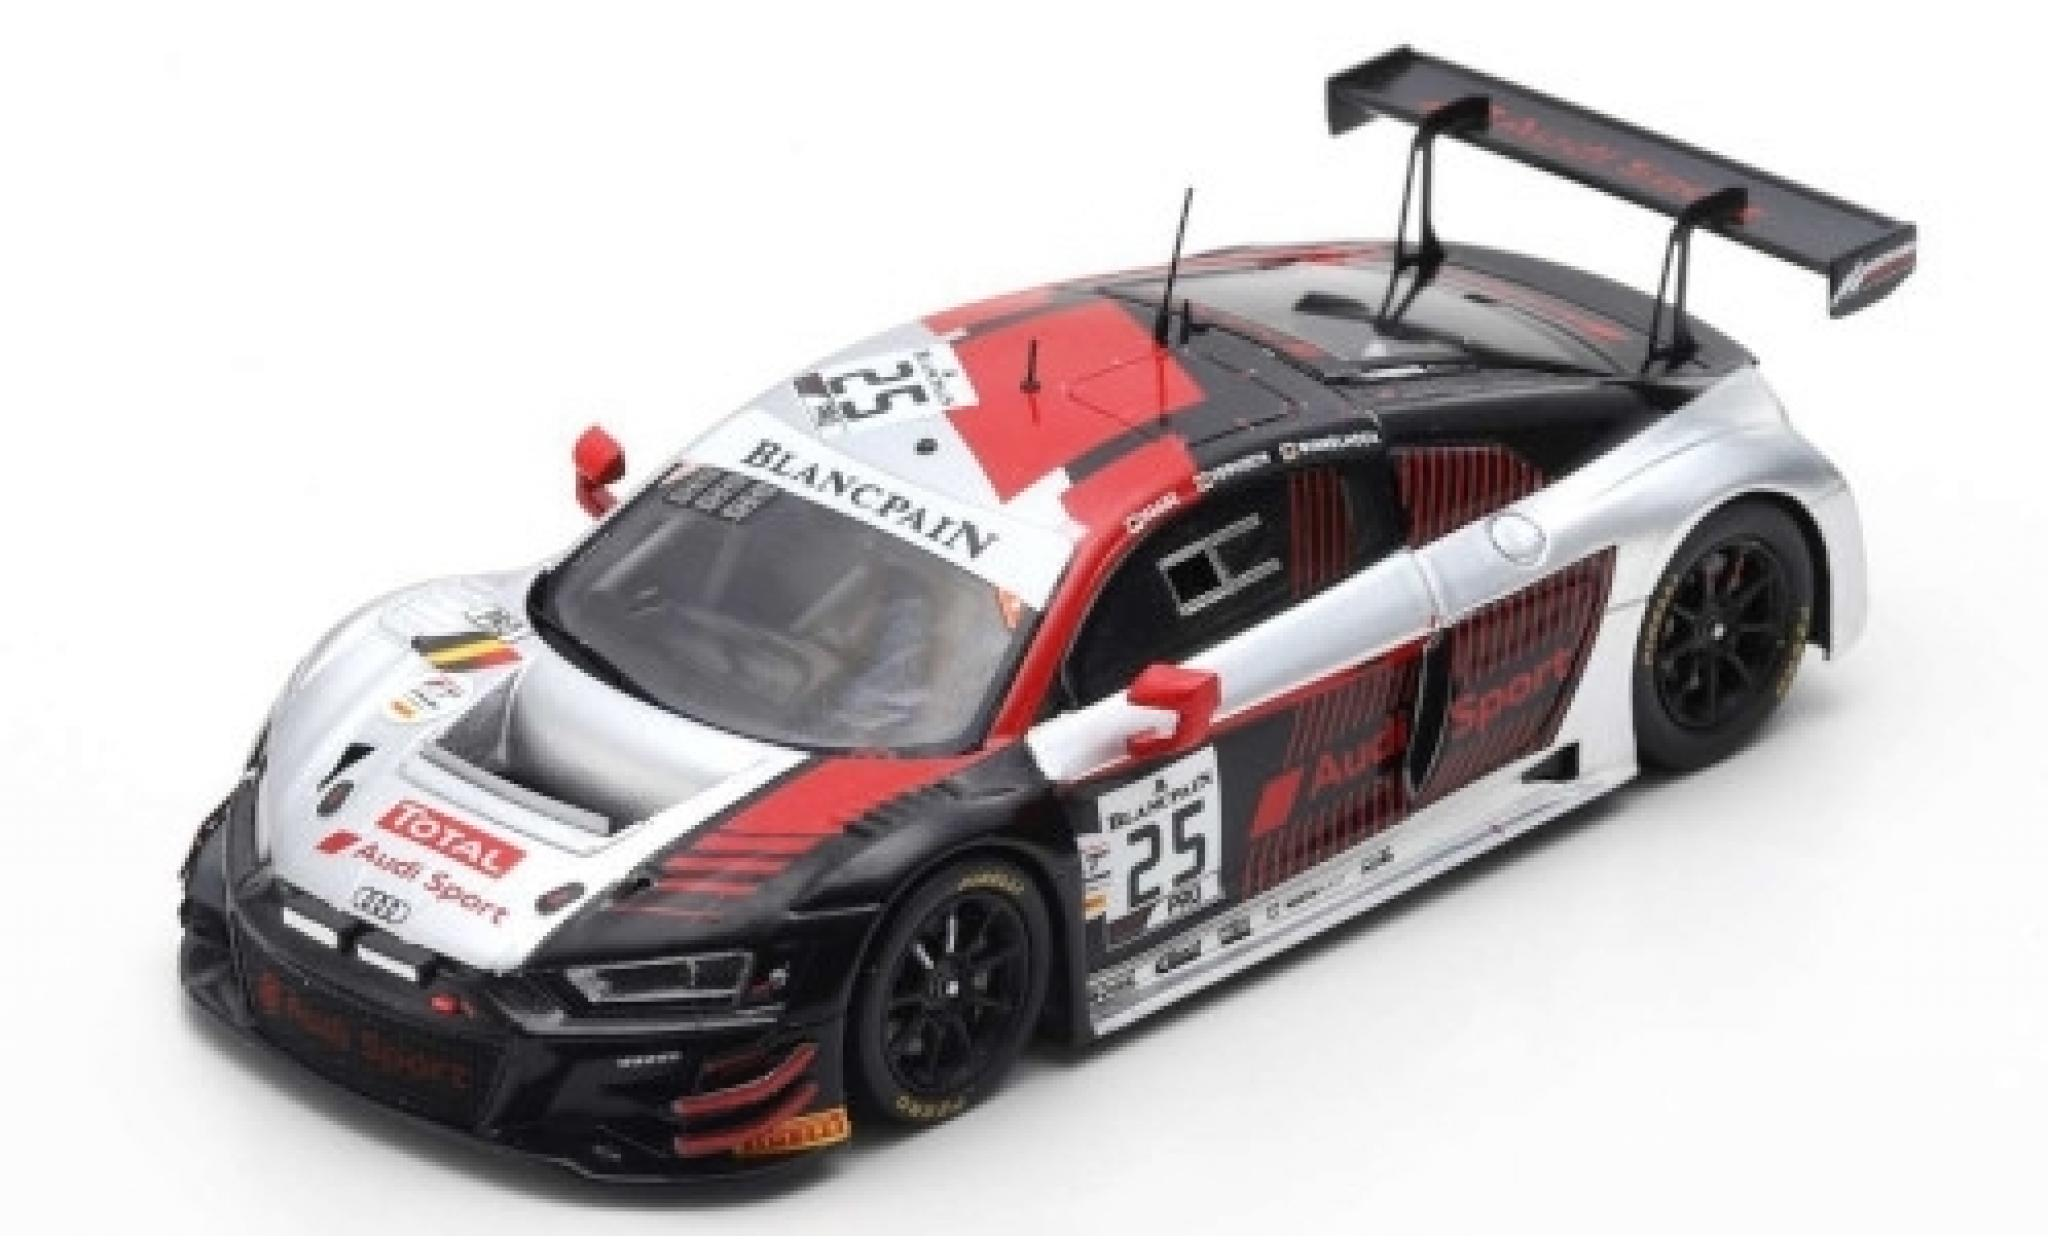 Audi R8 1/43 Spark LMS GT3 No.25 Sport Sainteloc Racing 24h Spa 2019 M.Winkelhock/F.Vervisch/C.Haase